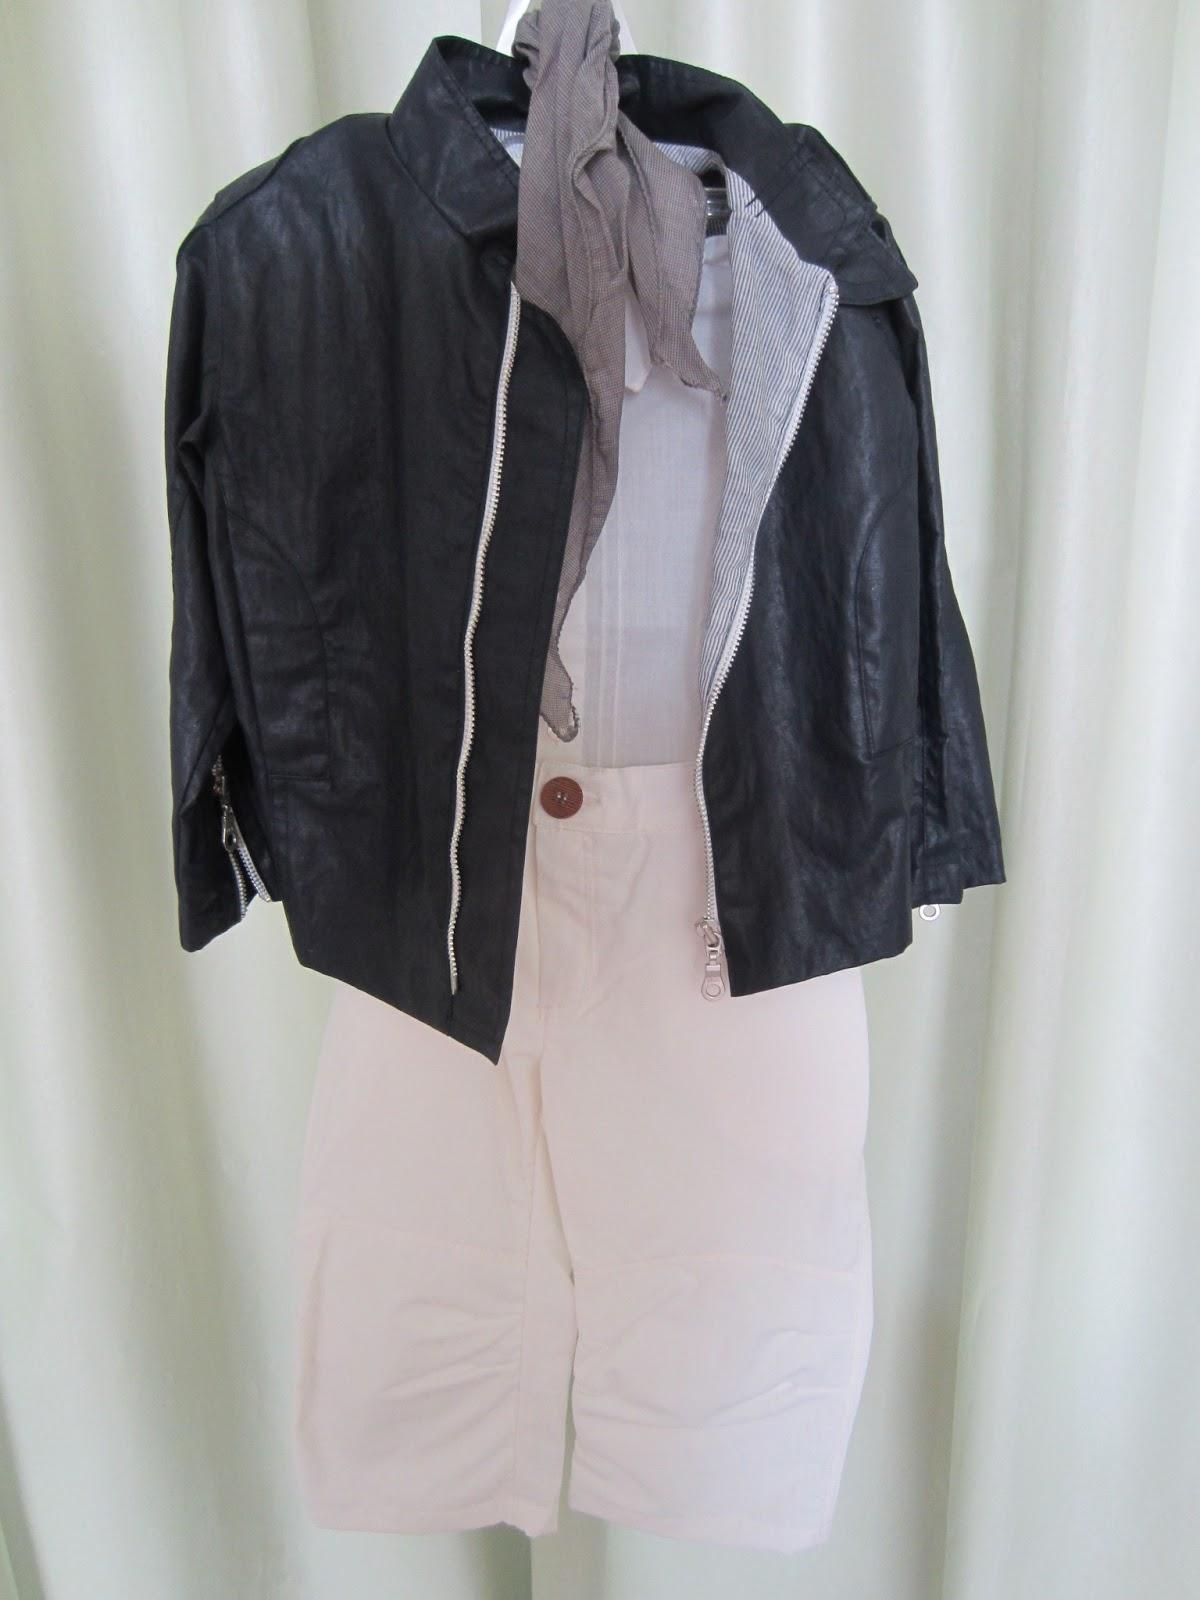 1bc04b035ec Παντελόνι, πουκάμισο, φουλάρι, σακάκι και καπέλο. Νο 2. Τιμή: 60 ευρώ.